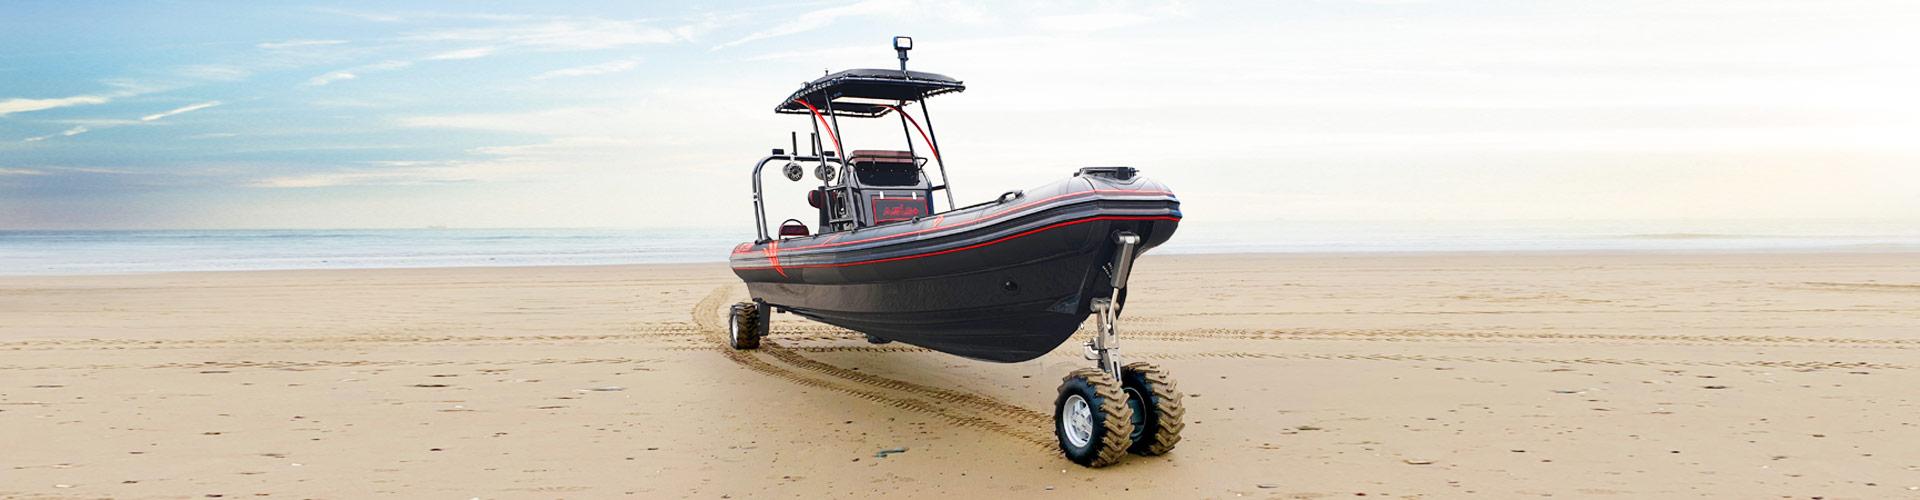 Experience-the-OCM-Amphibious-Boat-Live-Amphibiously